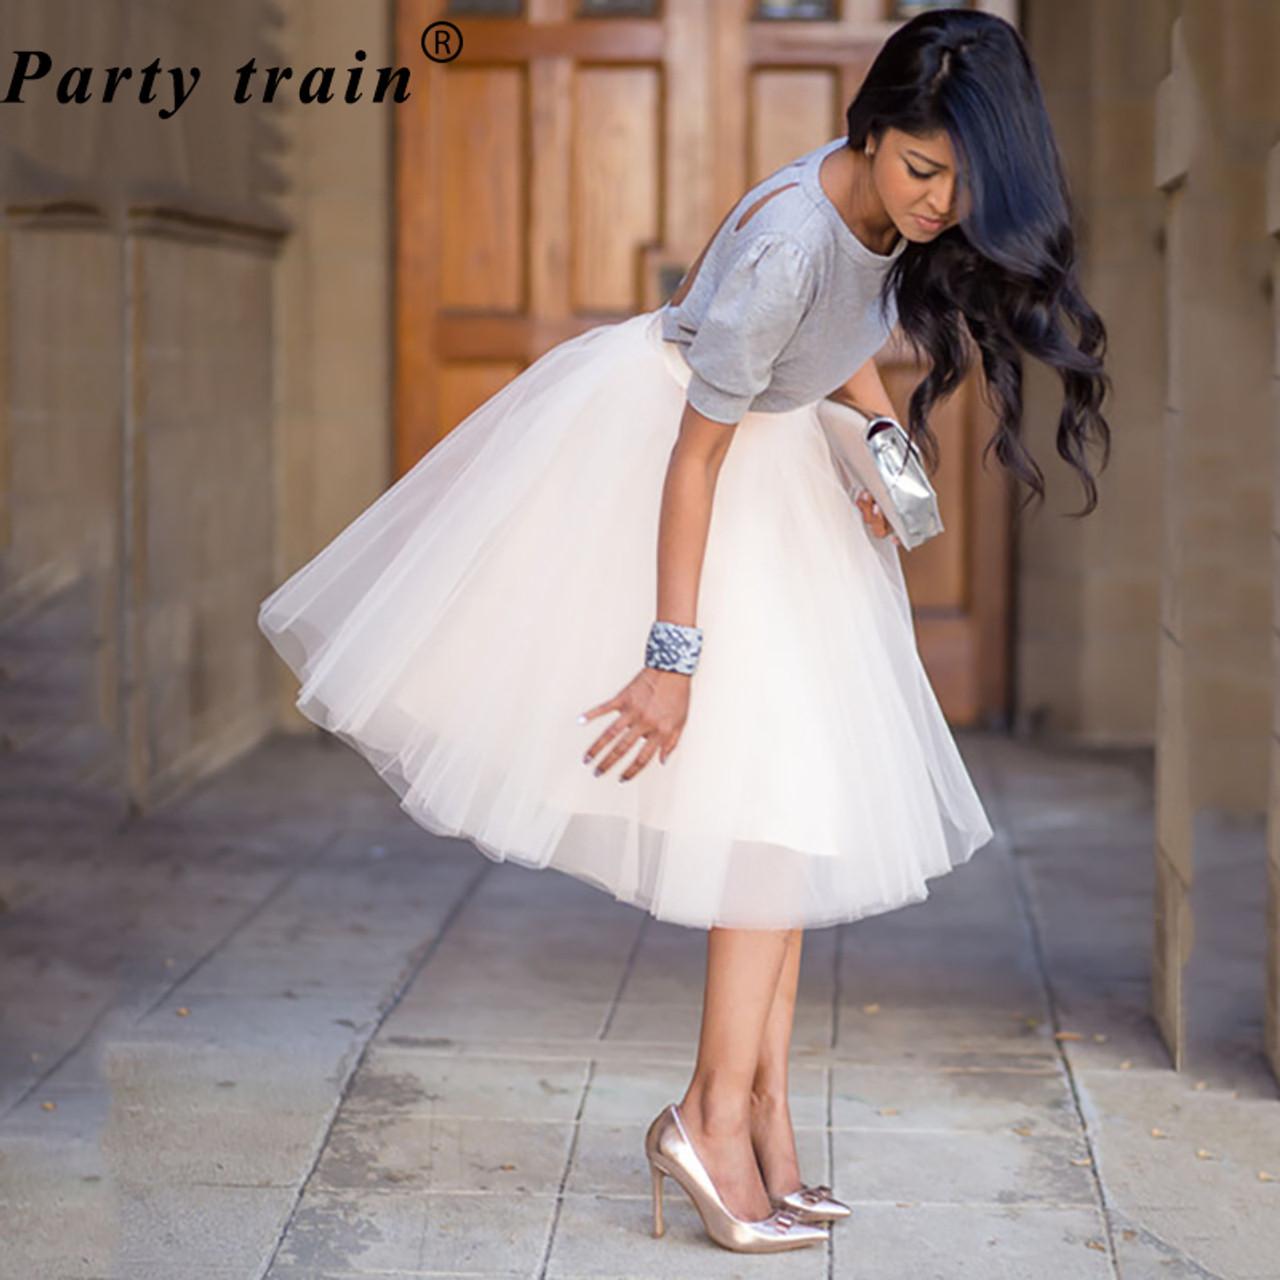 4 Layers 64cm Princess Midi Tulle Skirt Pleated Dance Tutu Skirts Womens  Lolita Petticoat Jupe Saia faldas Denim Party Skirts